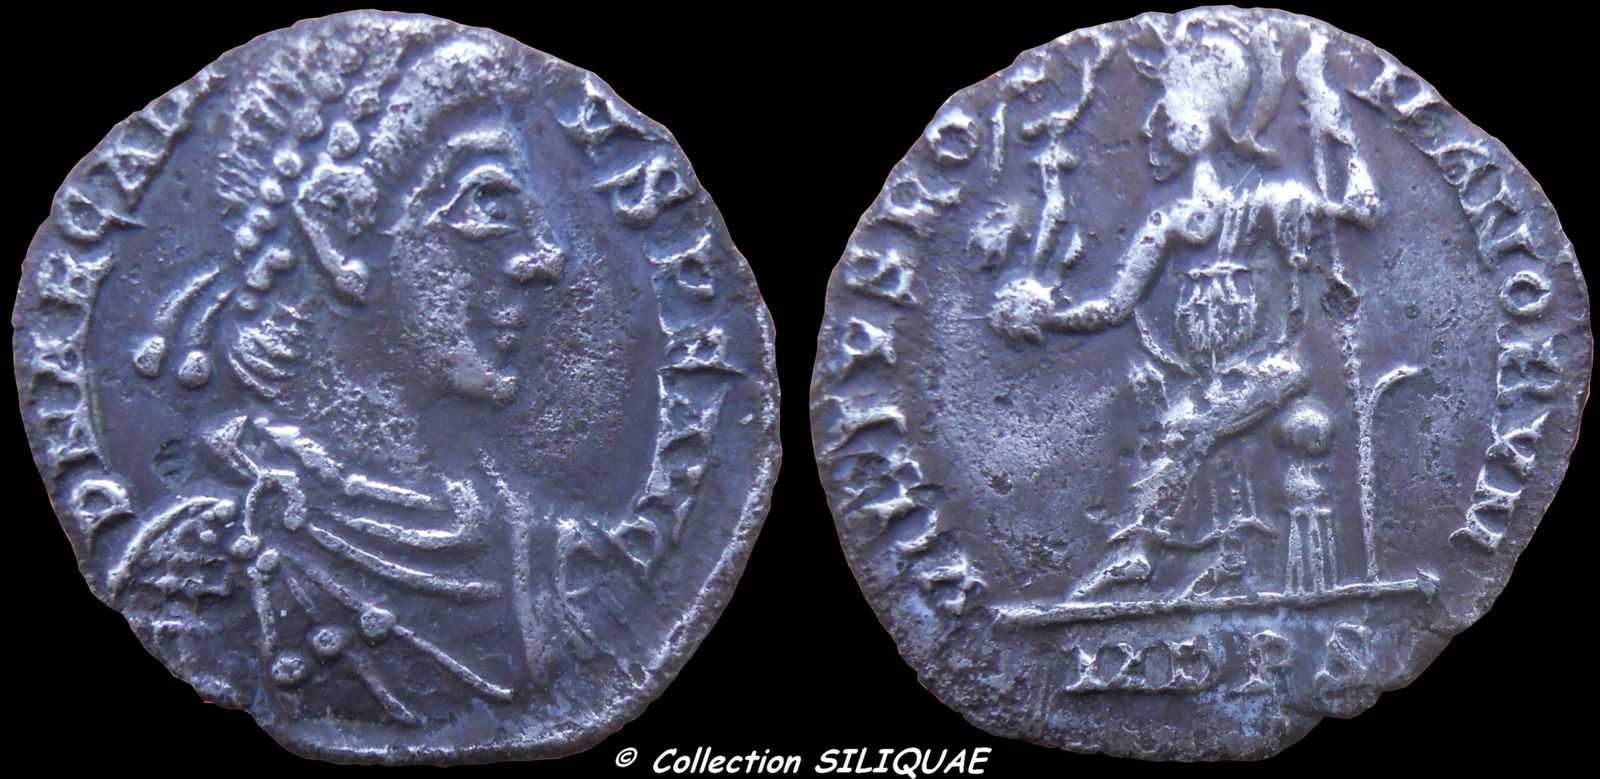 Collection Siliquae - Page 19 ARCADIUS-RIC1227d